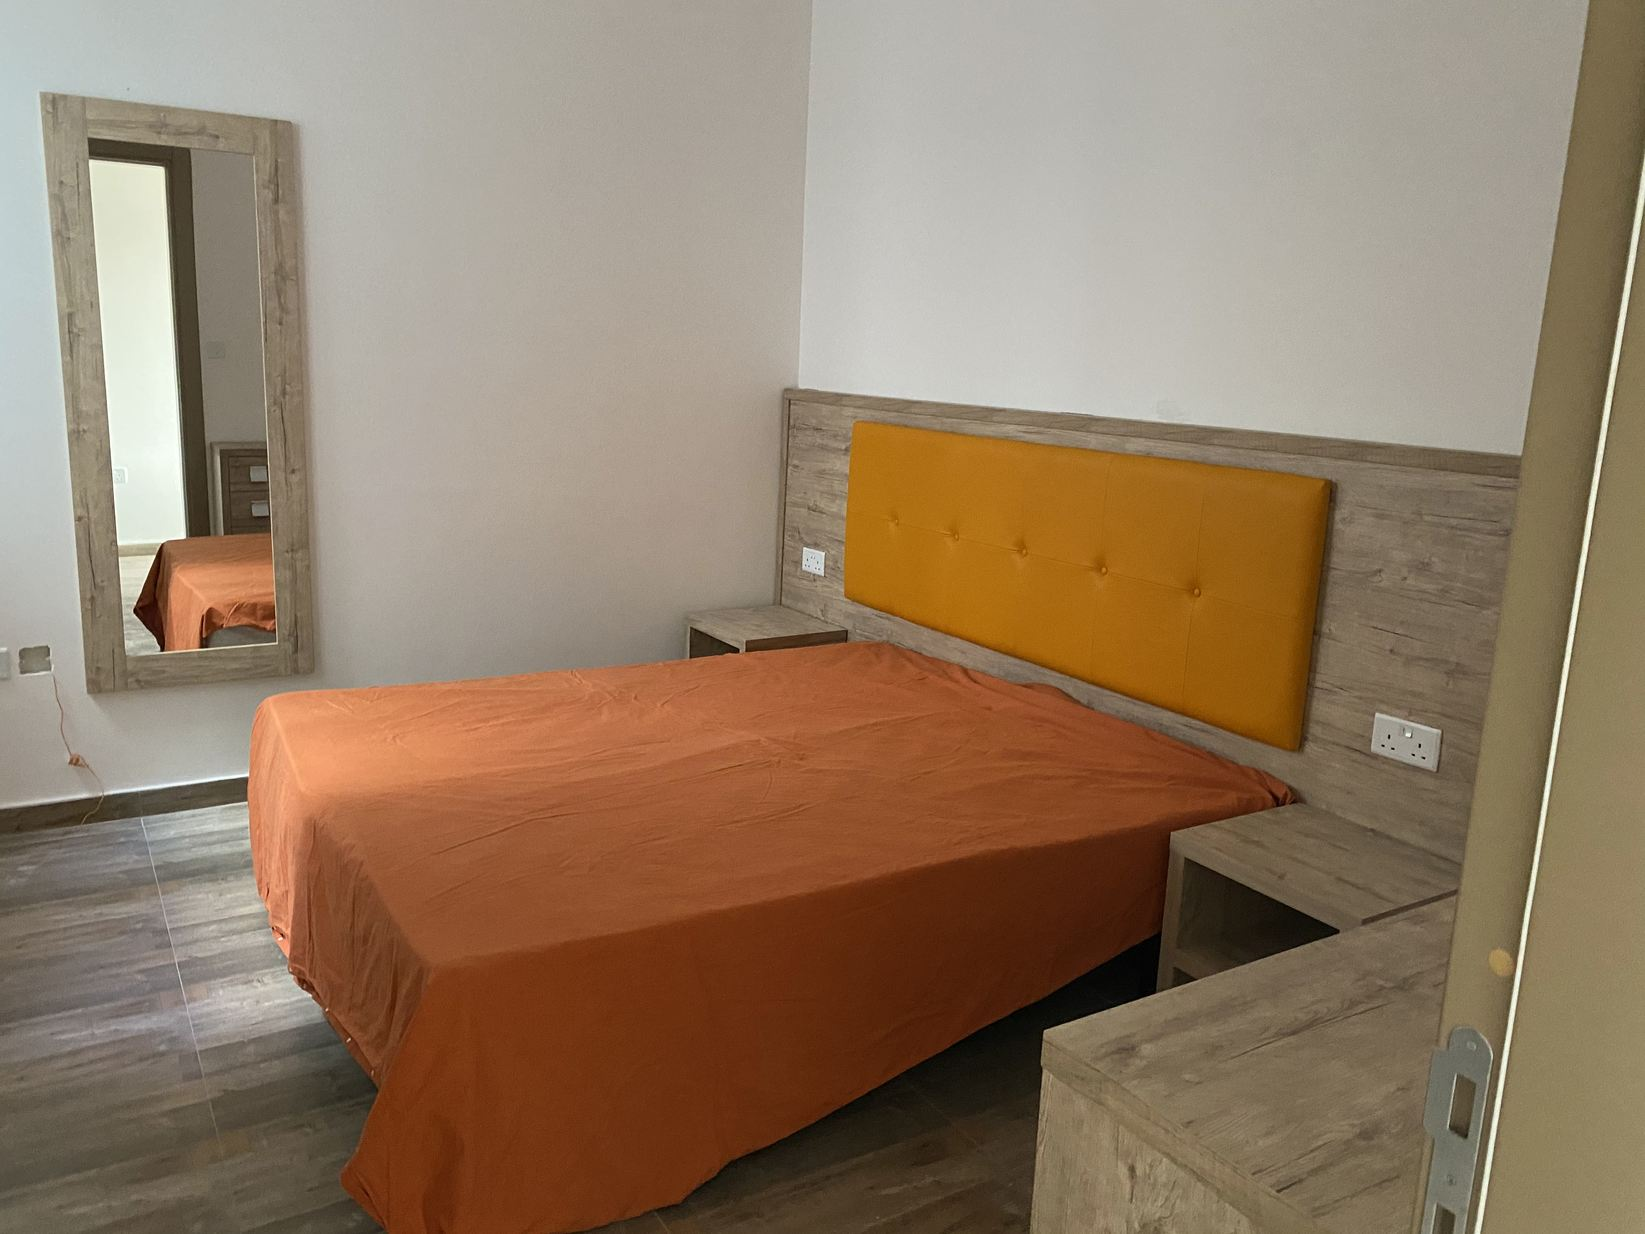 3 bed Apartment For Sale in qawra, Qawra - thumb 5